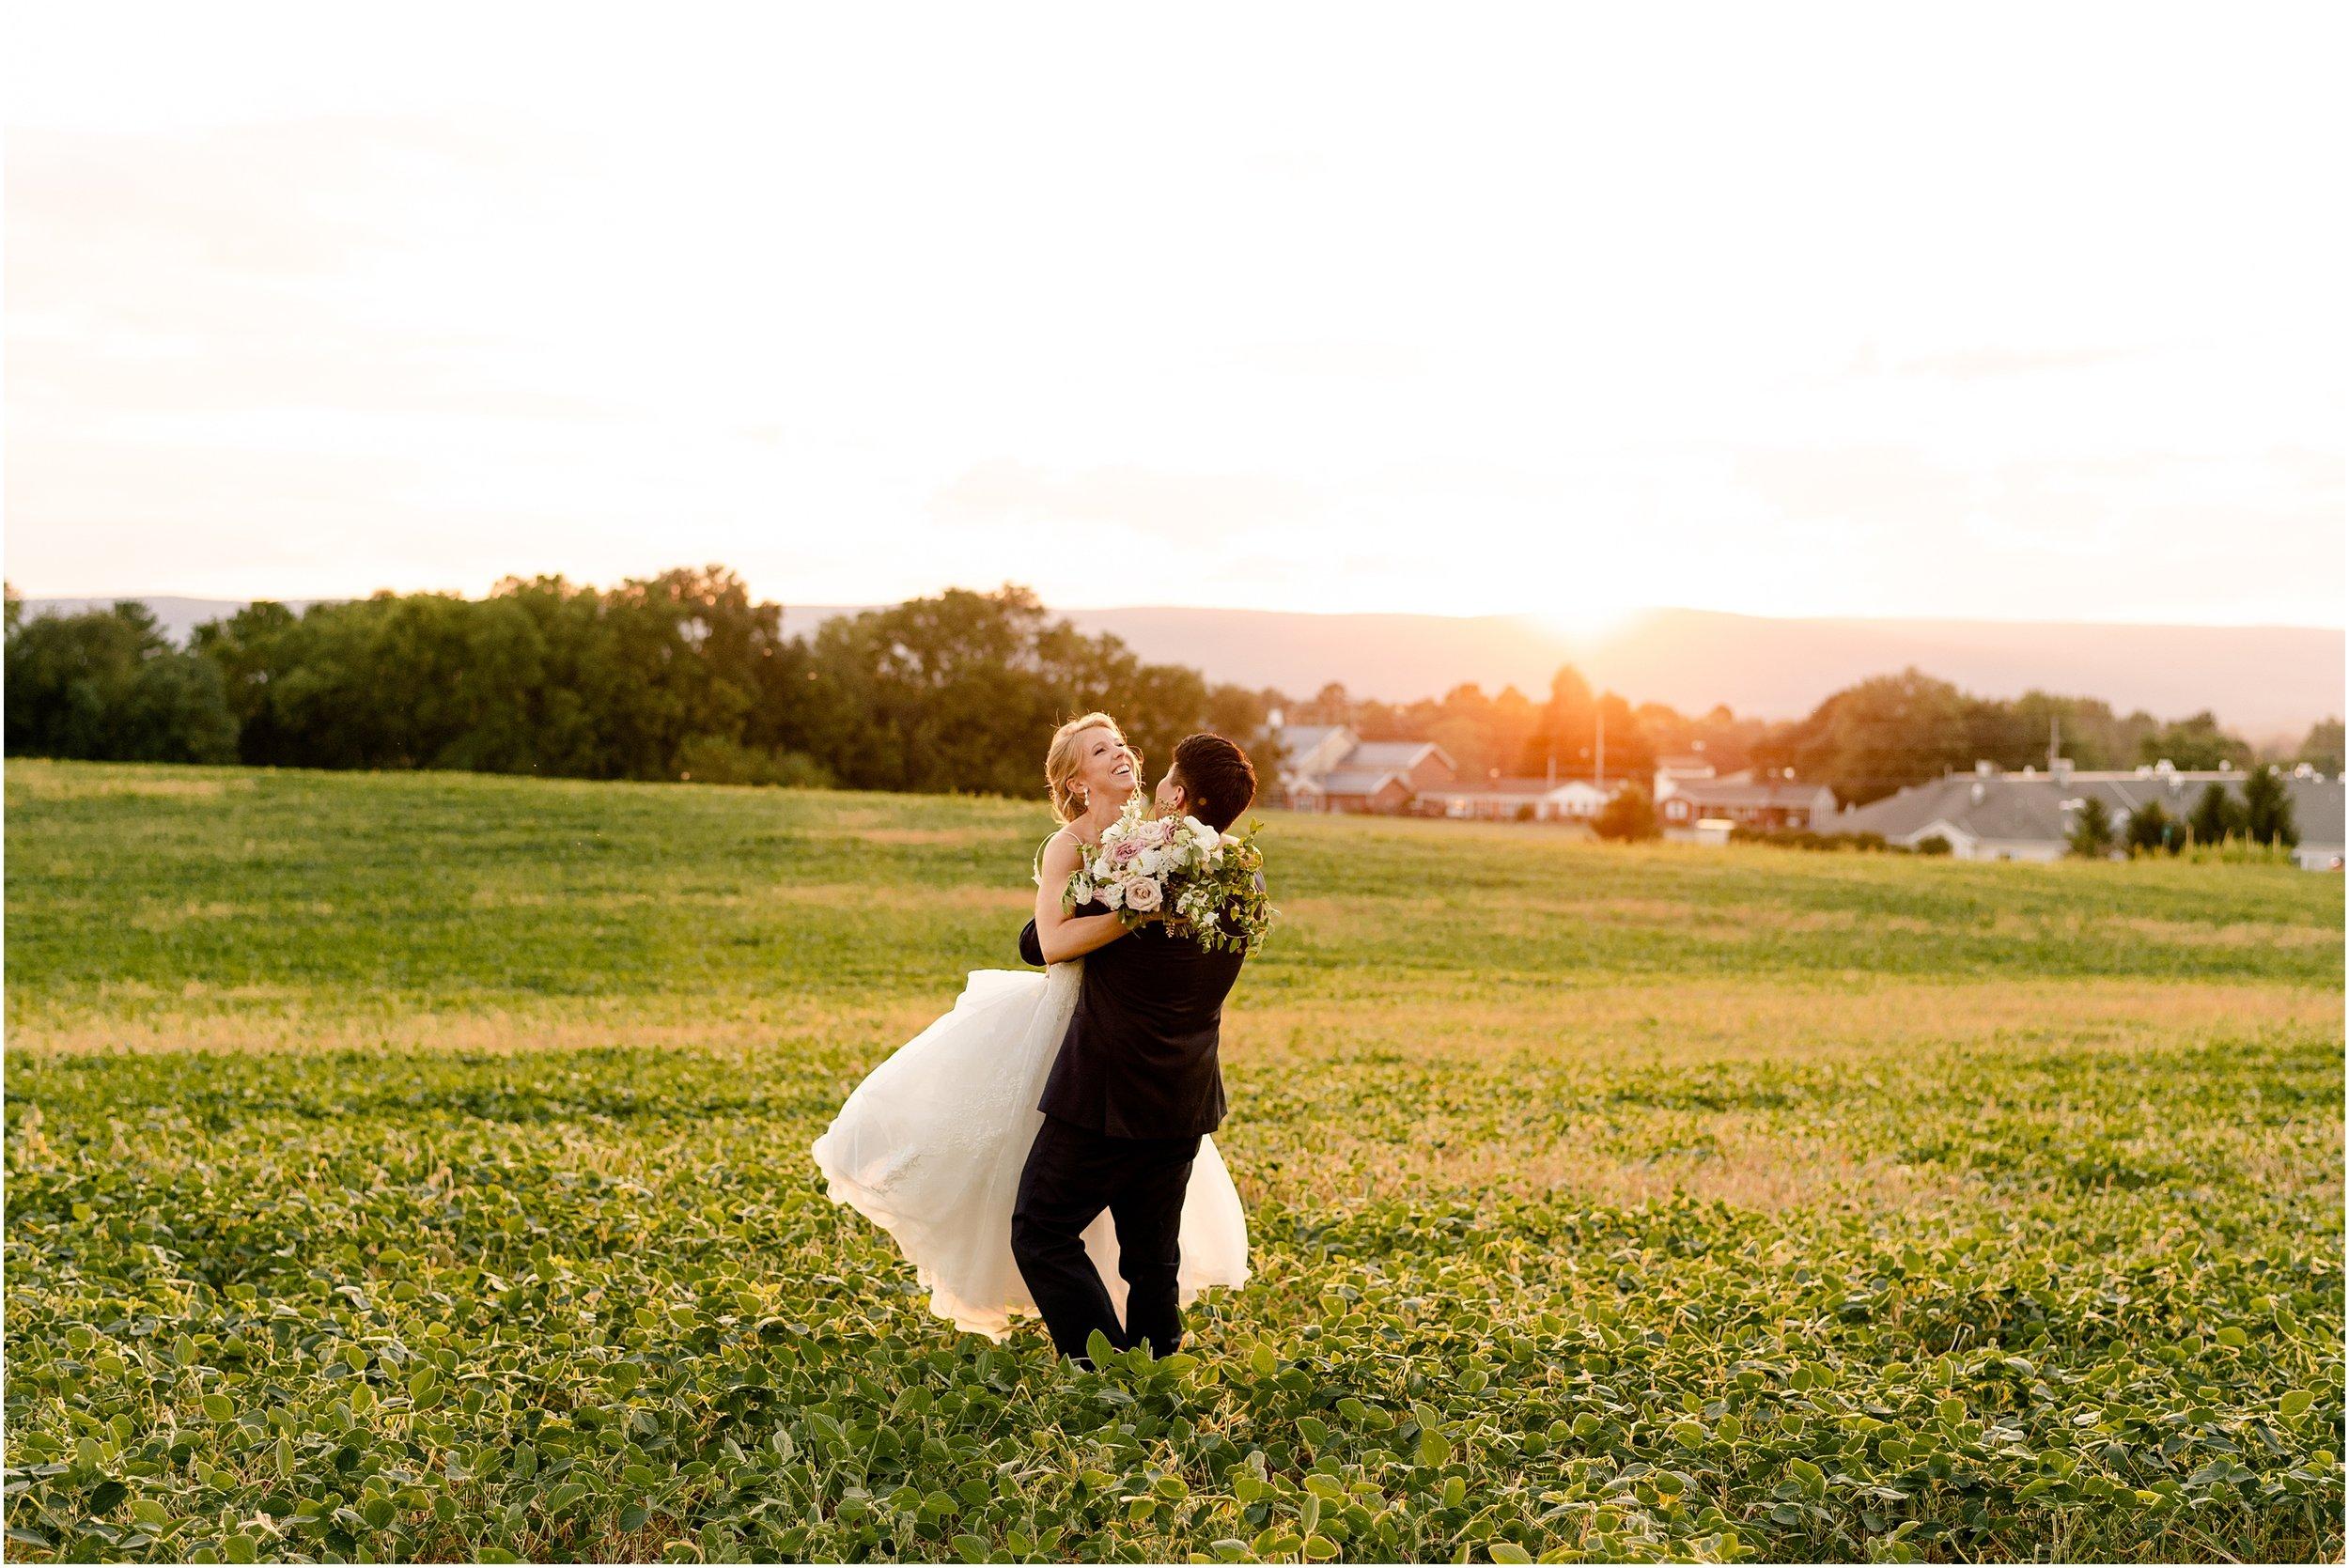 hannah leigh photography Walkers Overlook Wedding Walkersville MD_3568.jpg